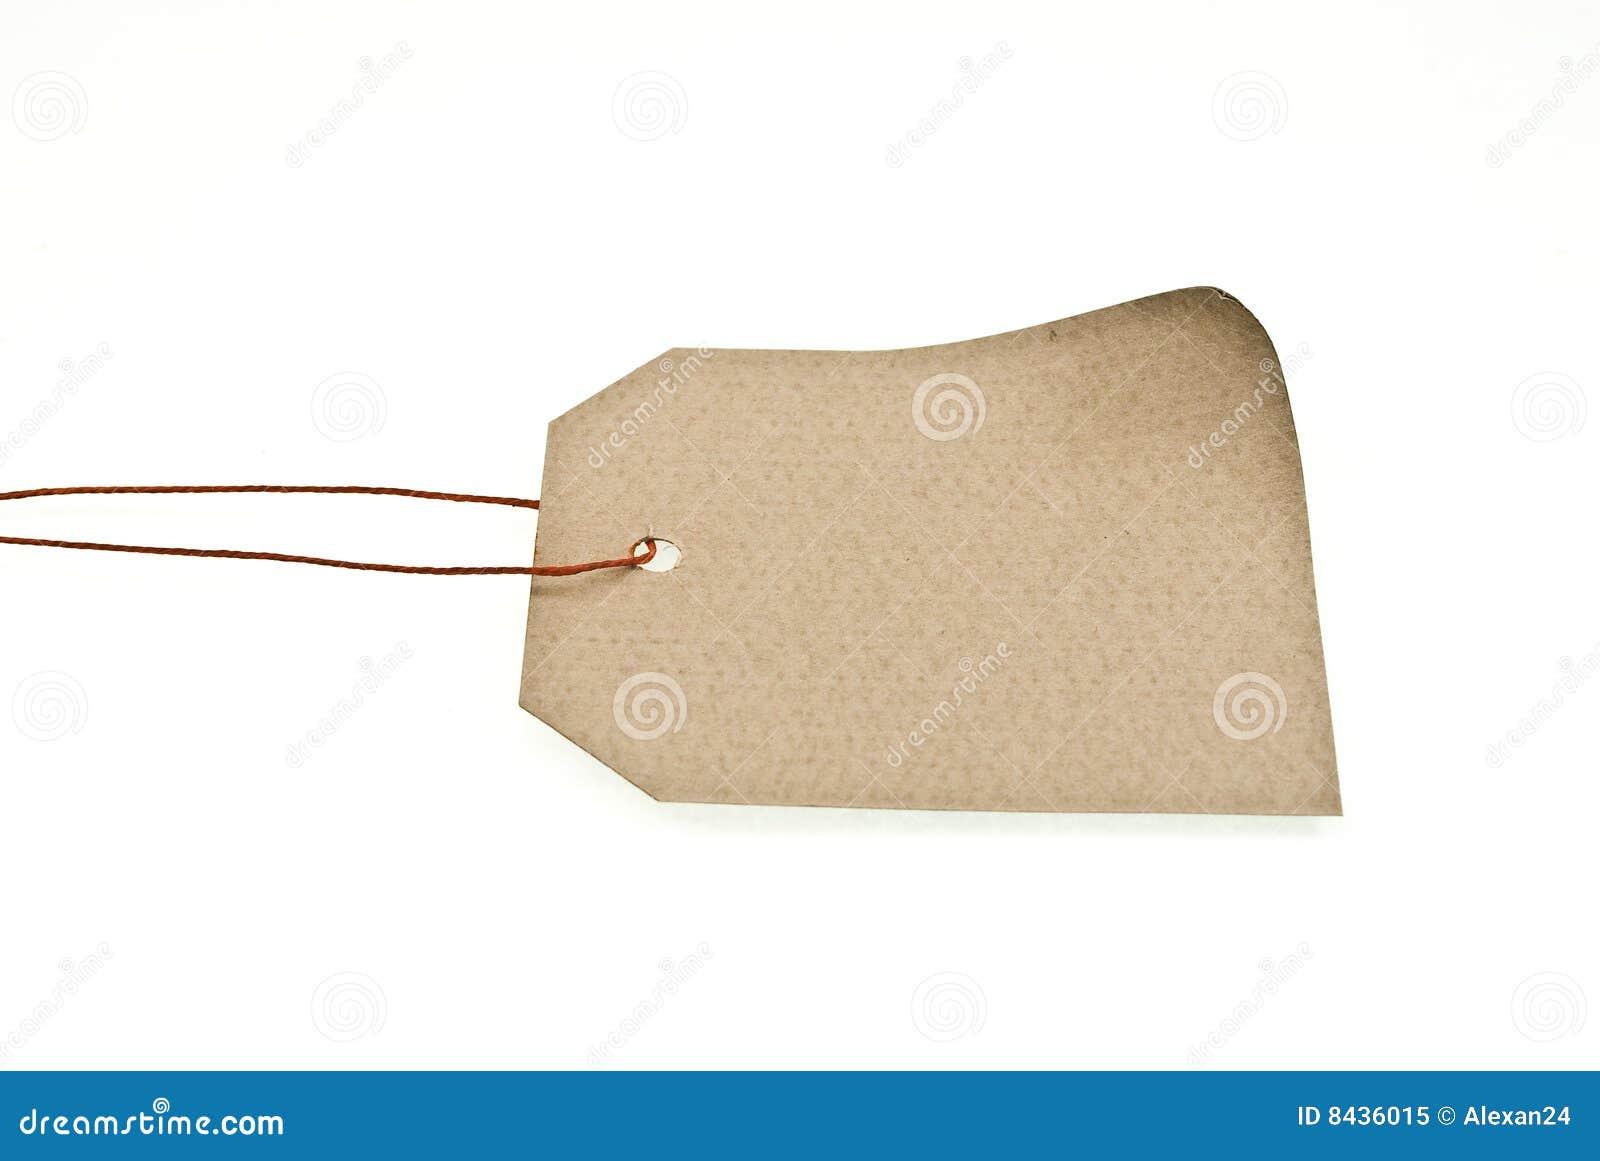 Shop label with lace